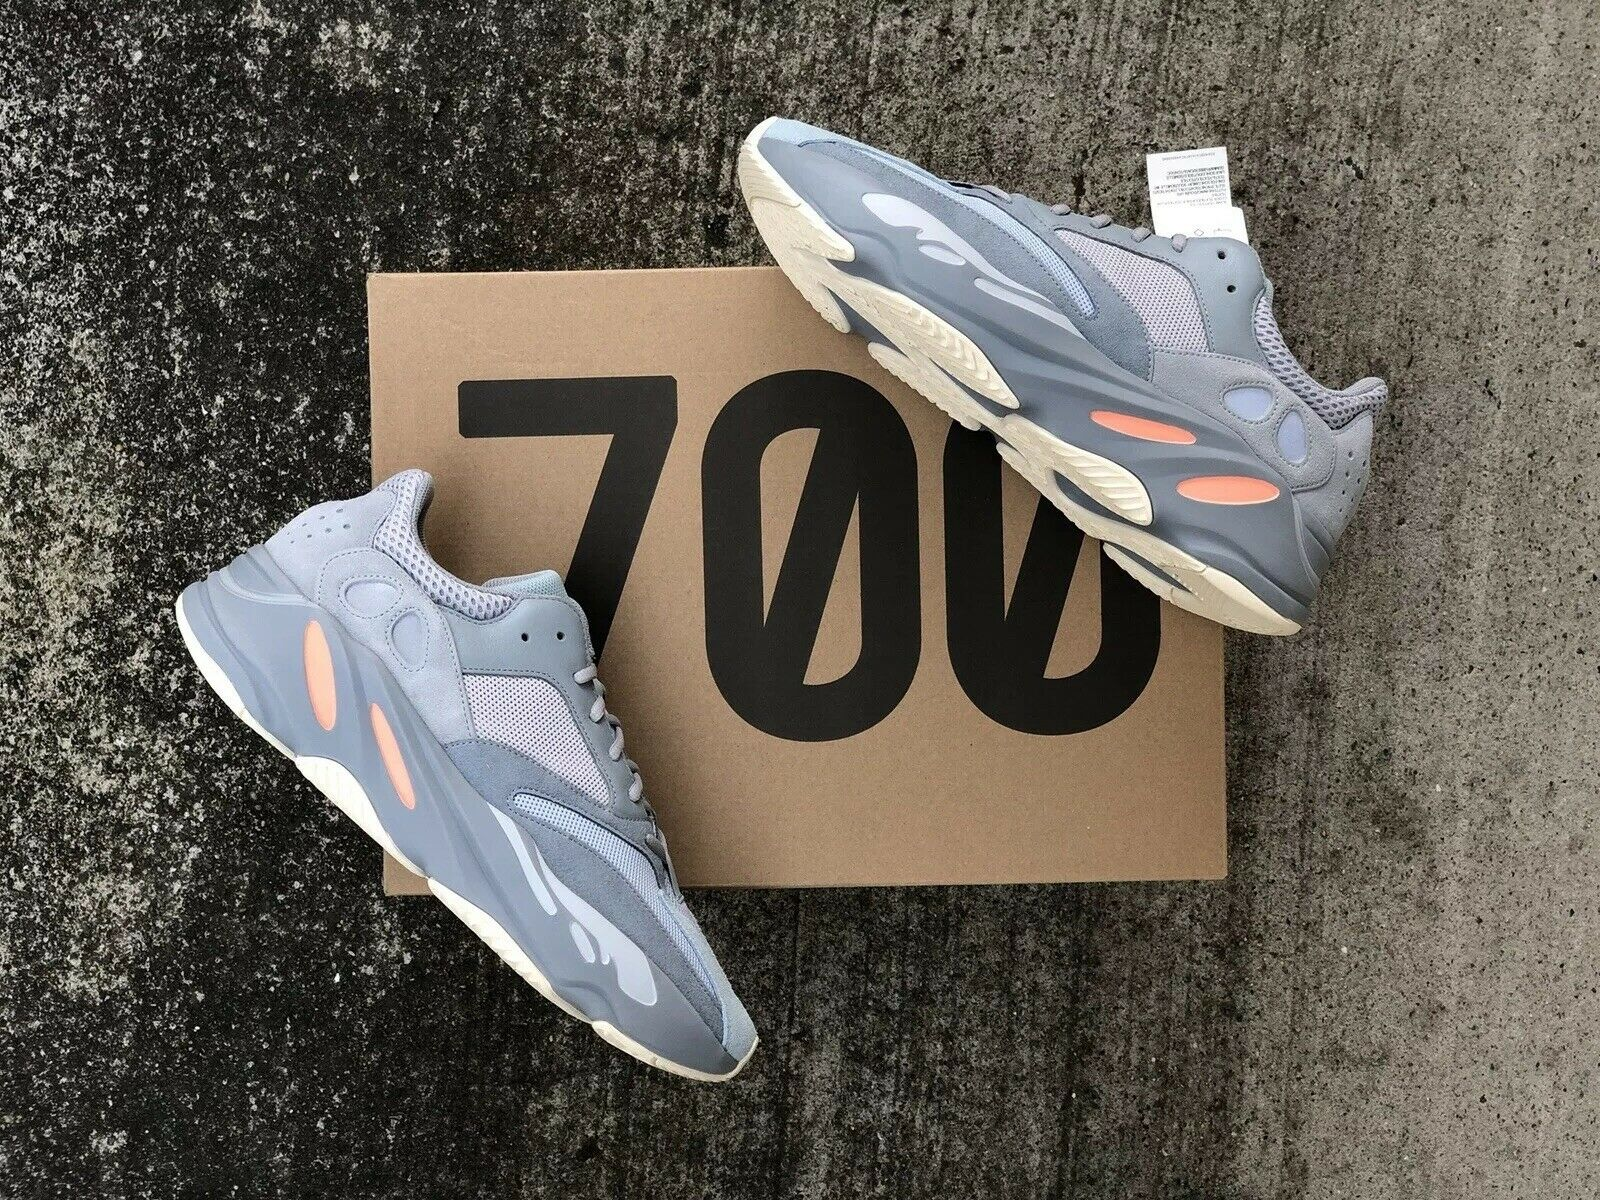 Adidas Yeezy Boost 700 Inertia Sz13 NEW DS